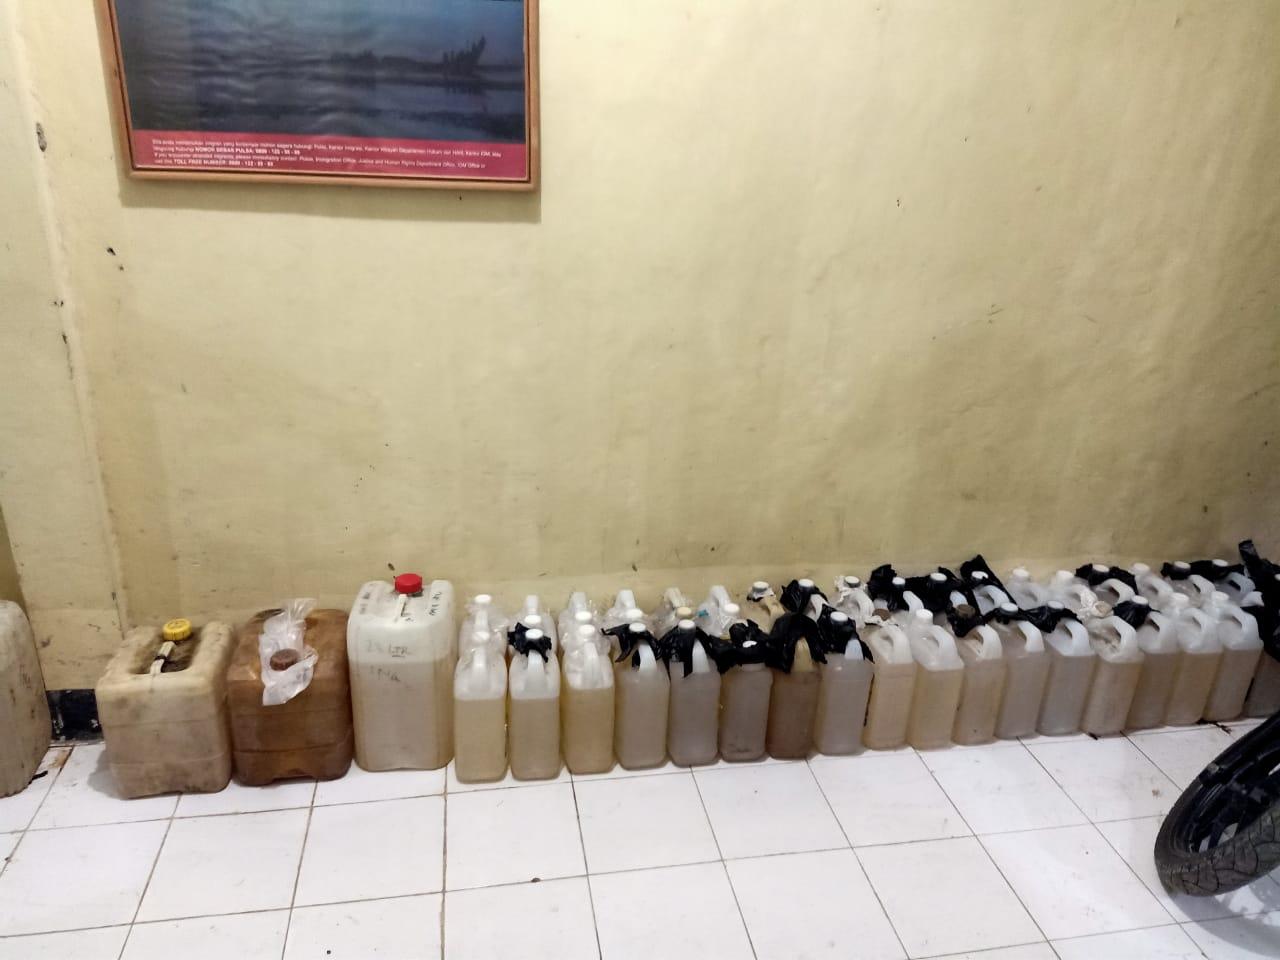 Polres Sumba Timur Amankan Ratusan Liter Minyak Tanah Hasil Penimbunan Tanpa Izin